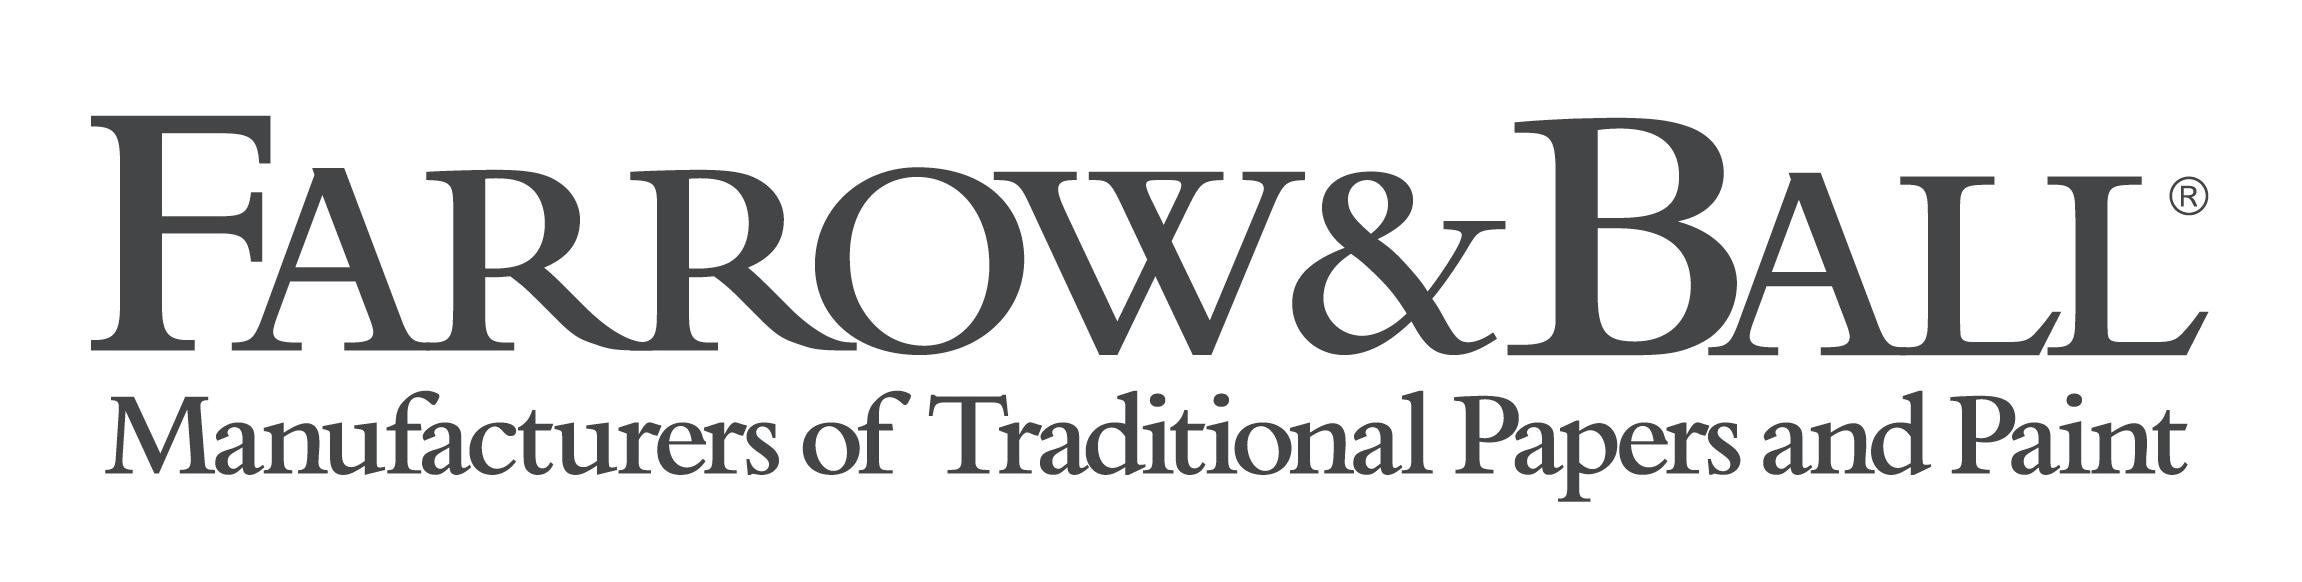 Farrow ball behang de vaal voor verf - Avis farrow and ball ...